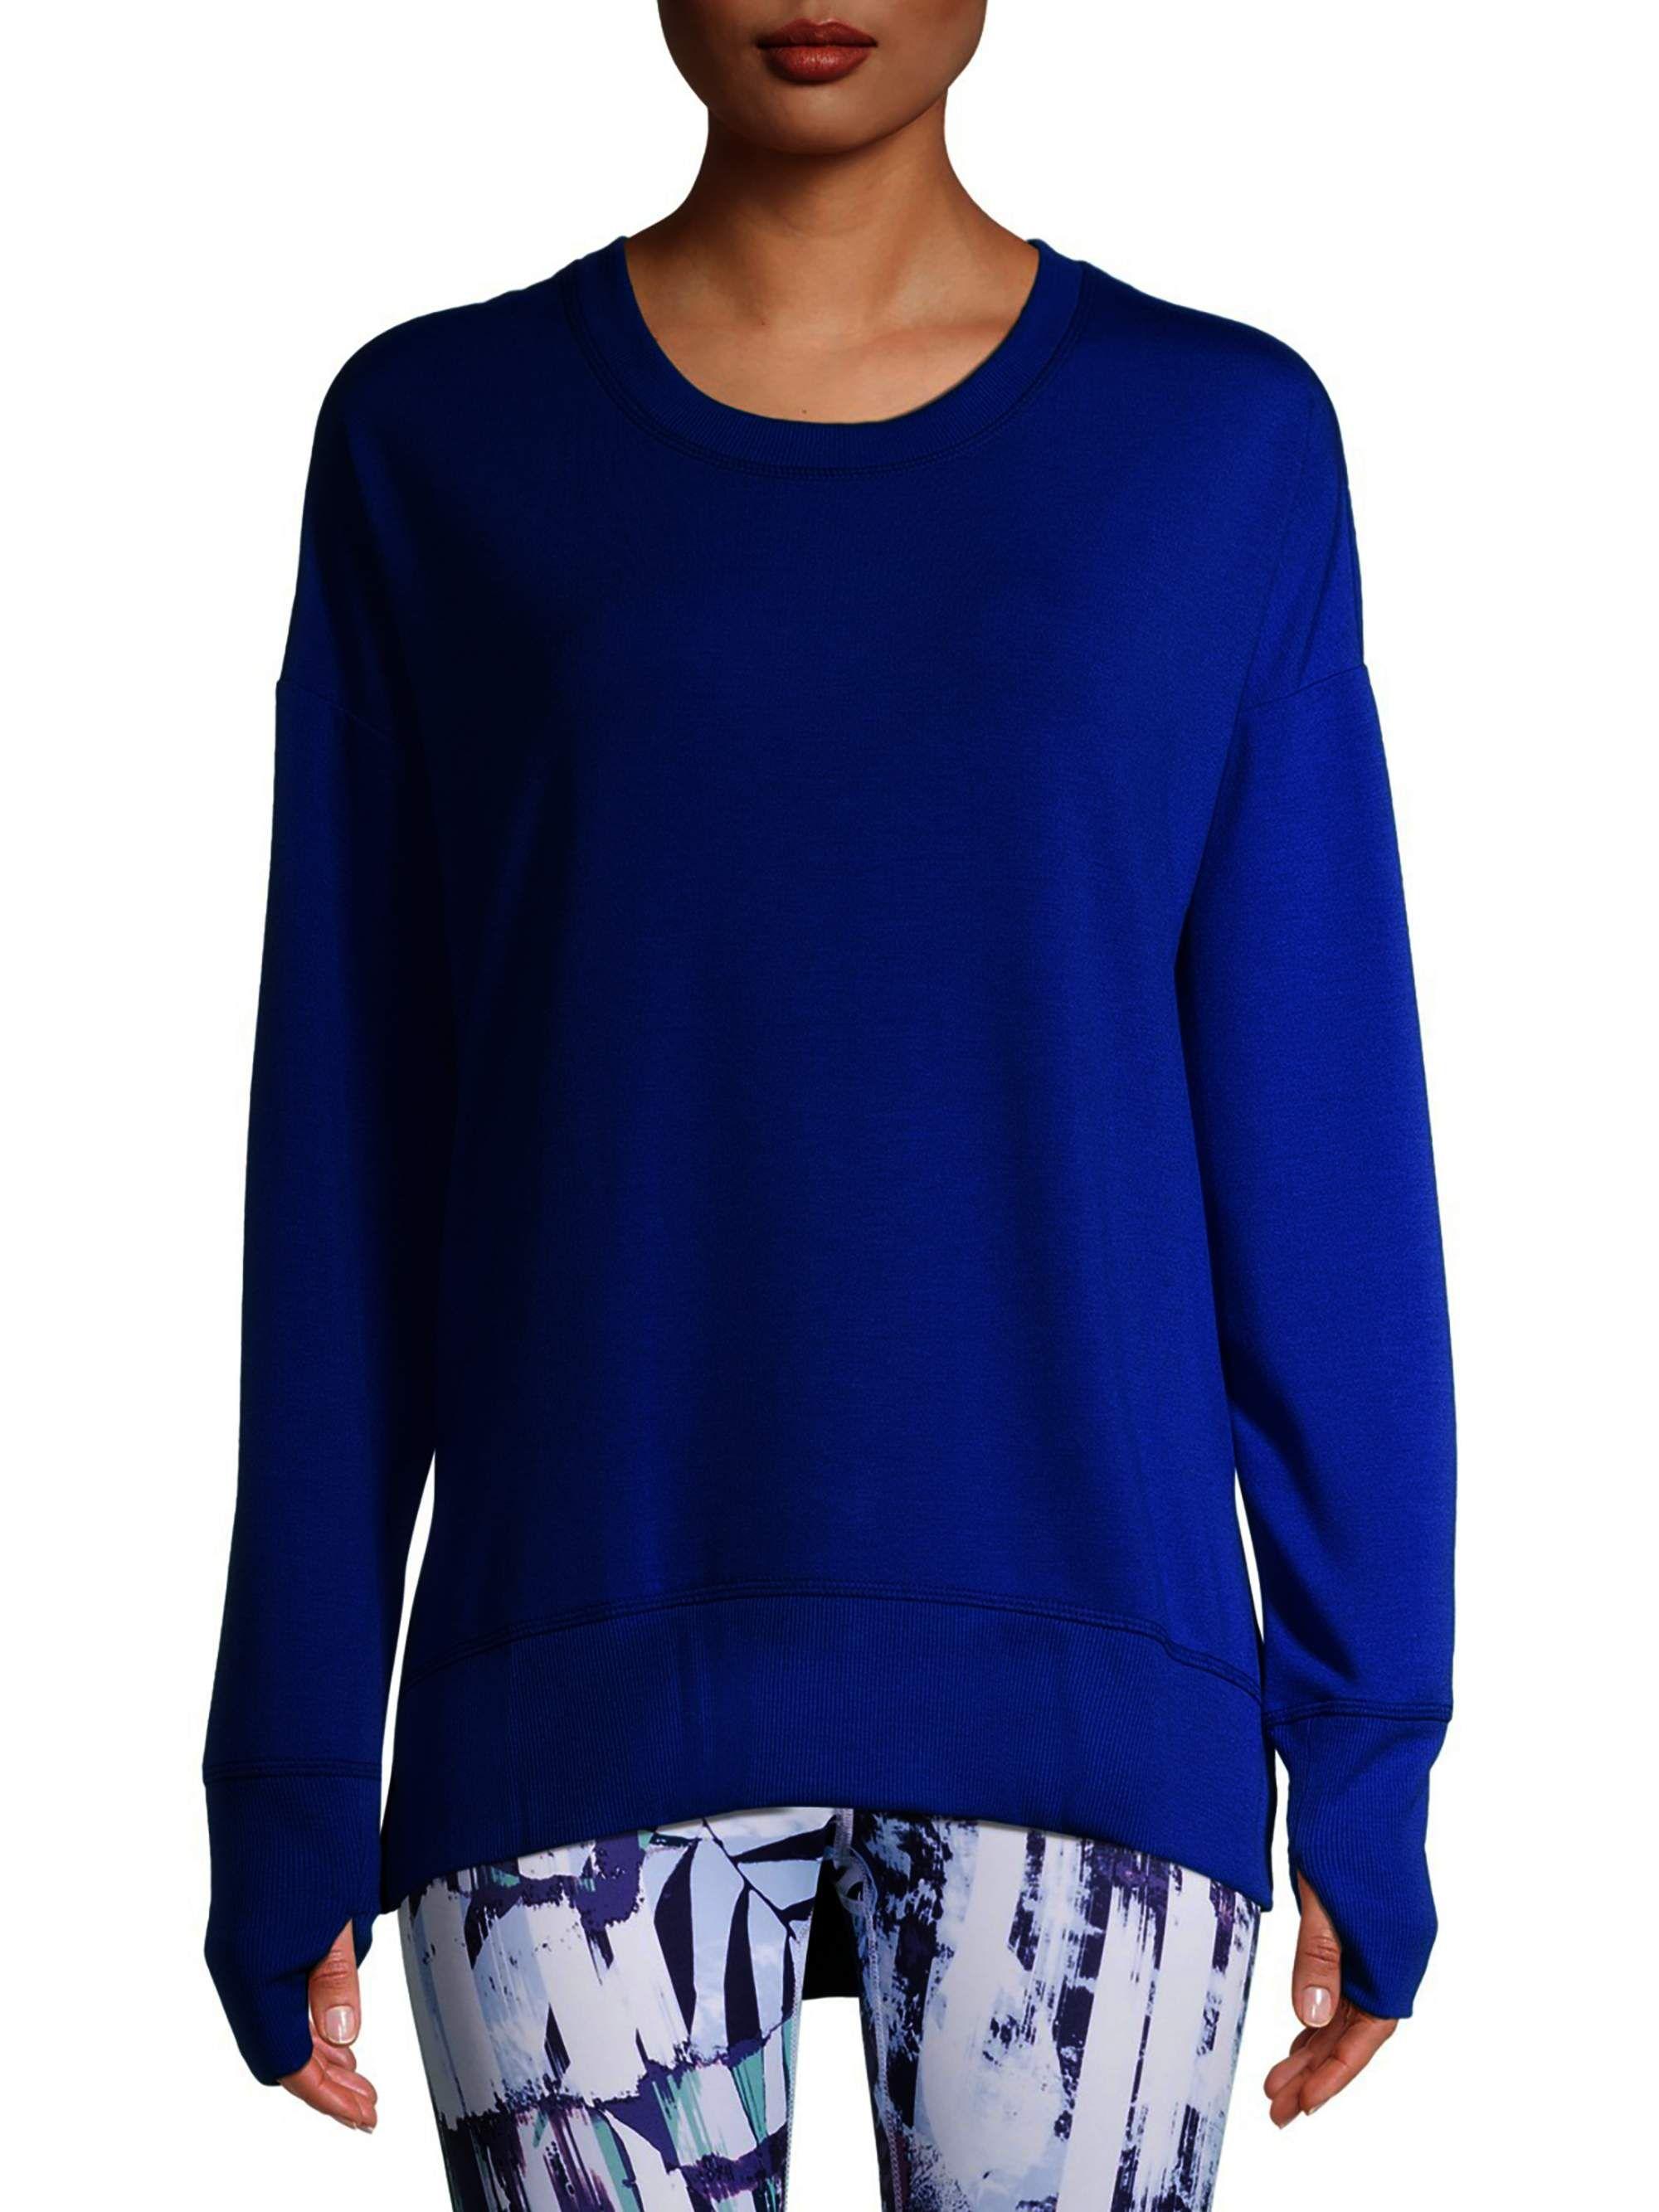 Avia Avia Women S Athleisure Long Sleeve Soft T Shirt Walmart Com Walmart Com Athleisure Women Long Sleeve T Shirts For Women [ 2667 x 2000 Pixel ]